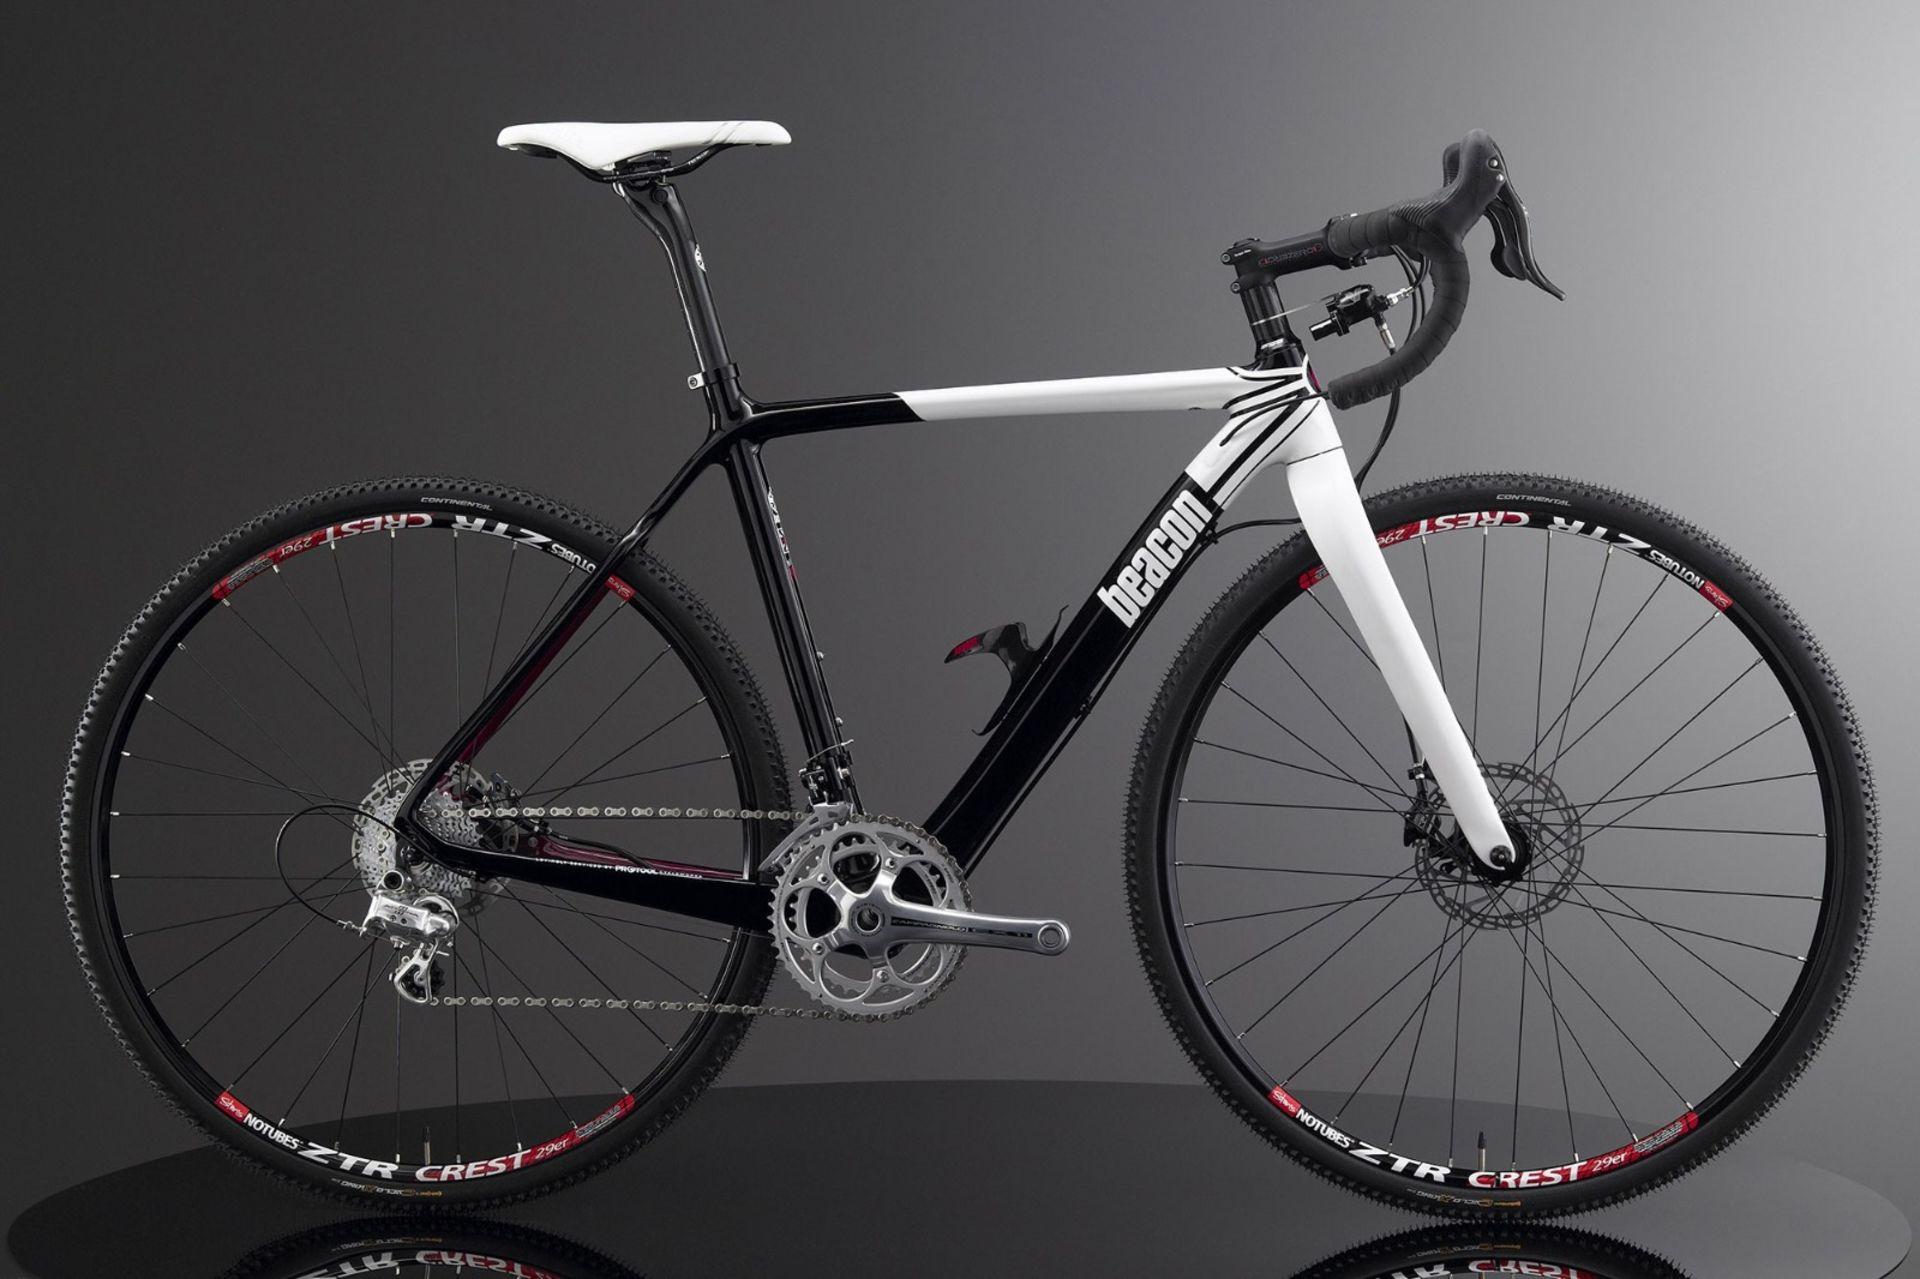 Lot 3 - 1 x Beacon Model BF-45, Size 525, Carbon Fibre Bike Frame in Black & White.